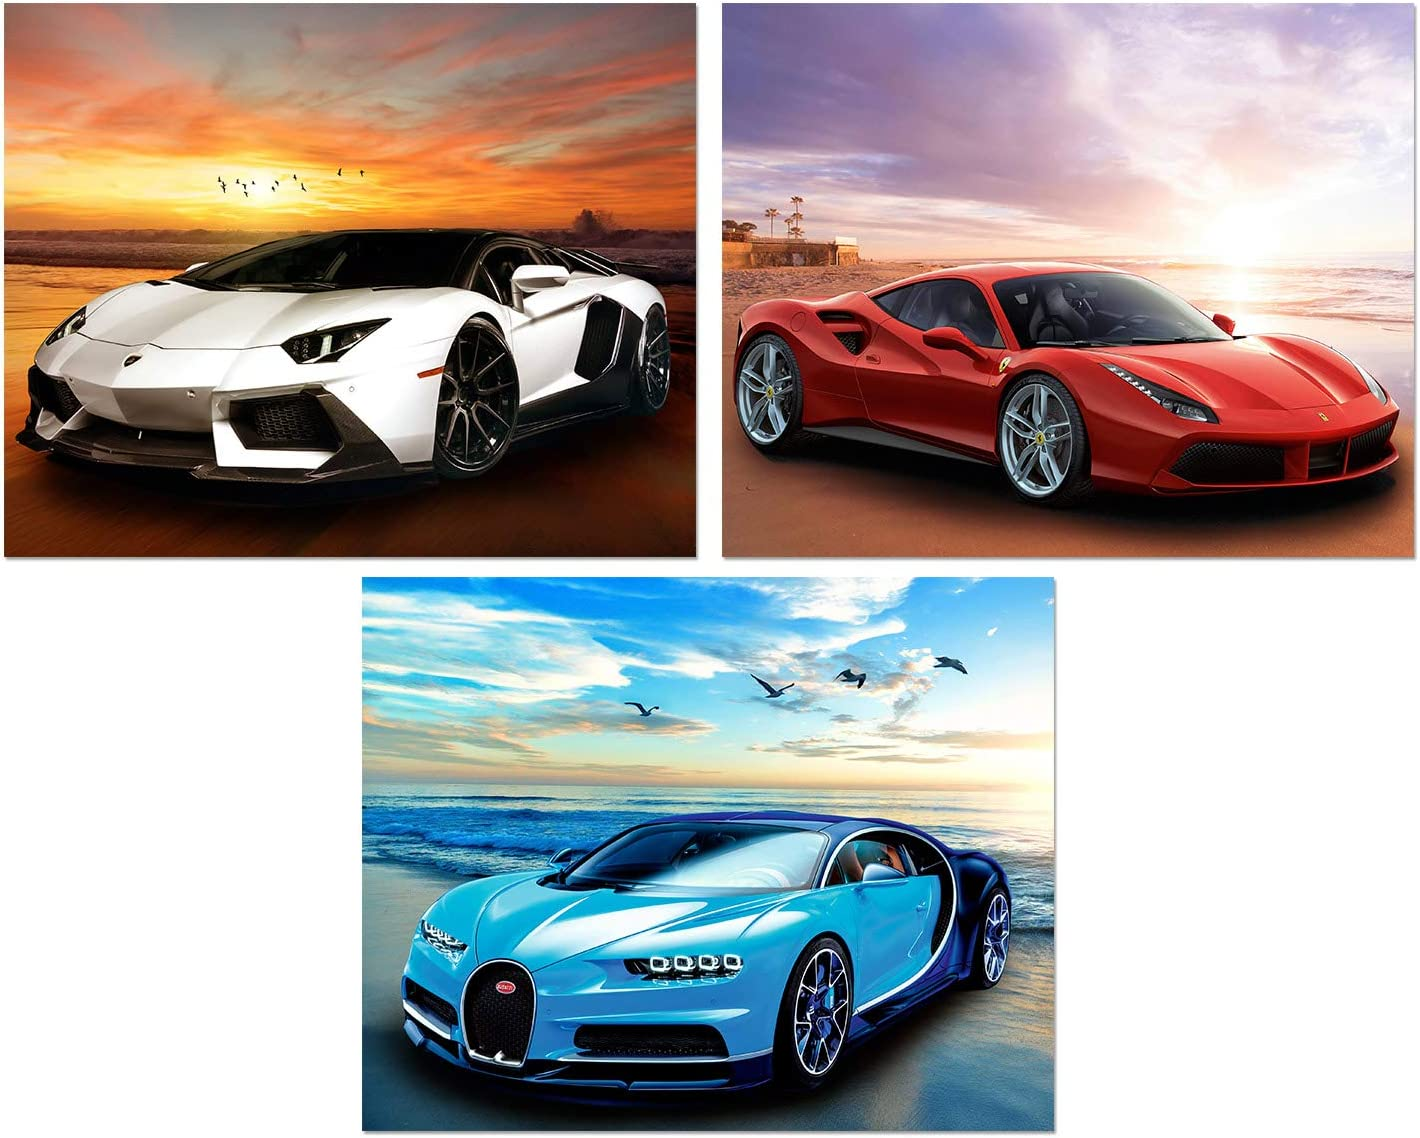 Car Posters - Lamborghini, Ferrari, Mclaren, Sports Car Wall Art - Supercar Decor Set of 3 Unframed (10x8 inches) Exotic Supercars Pictures - Beach Theme